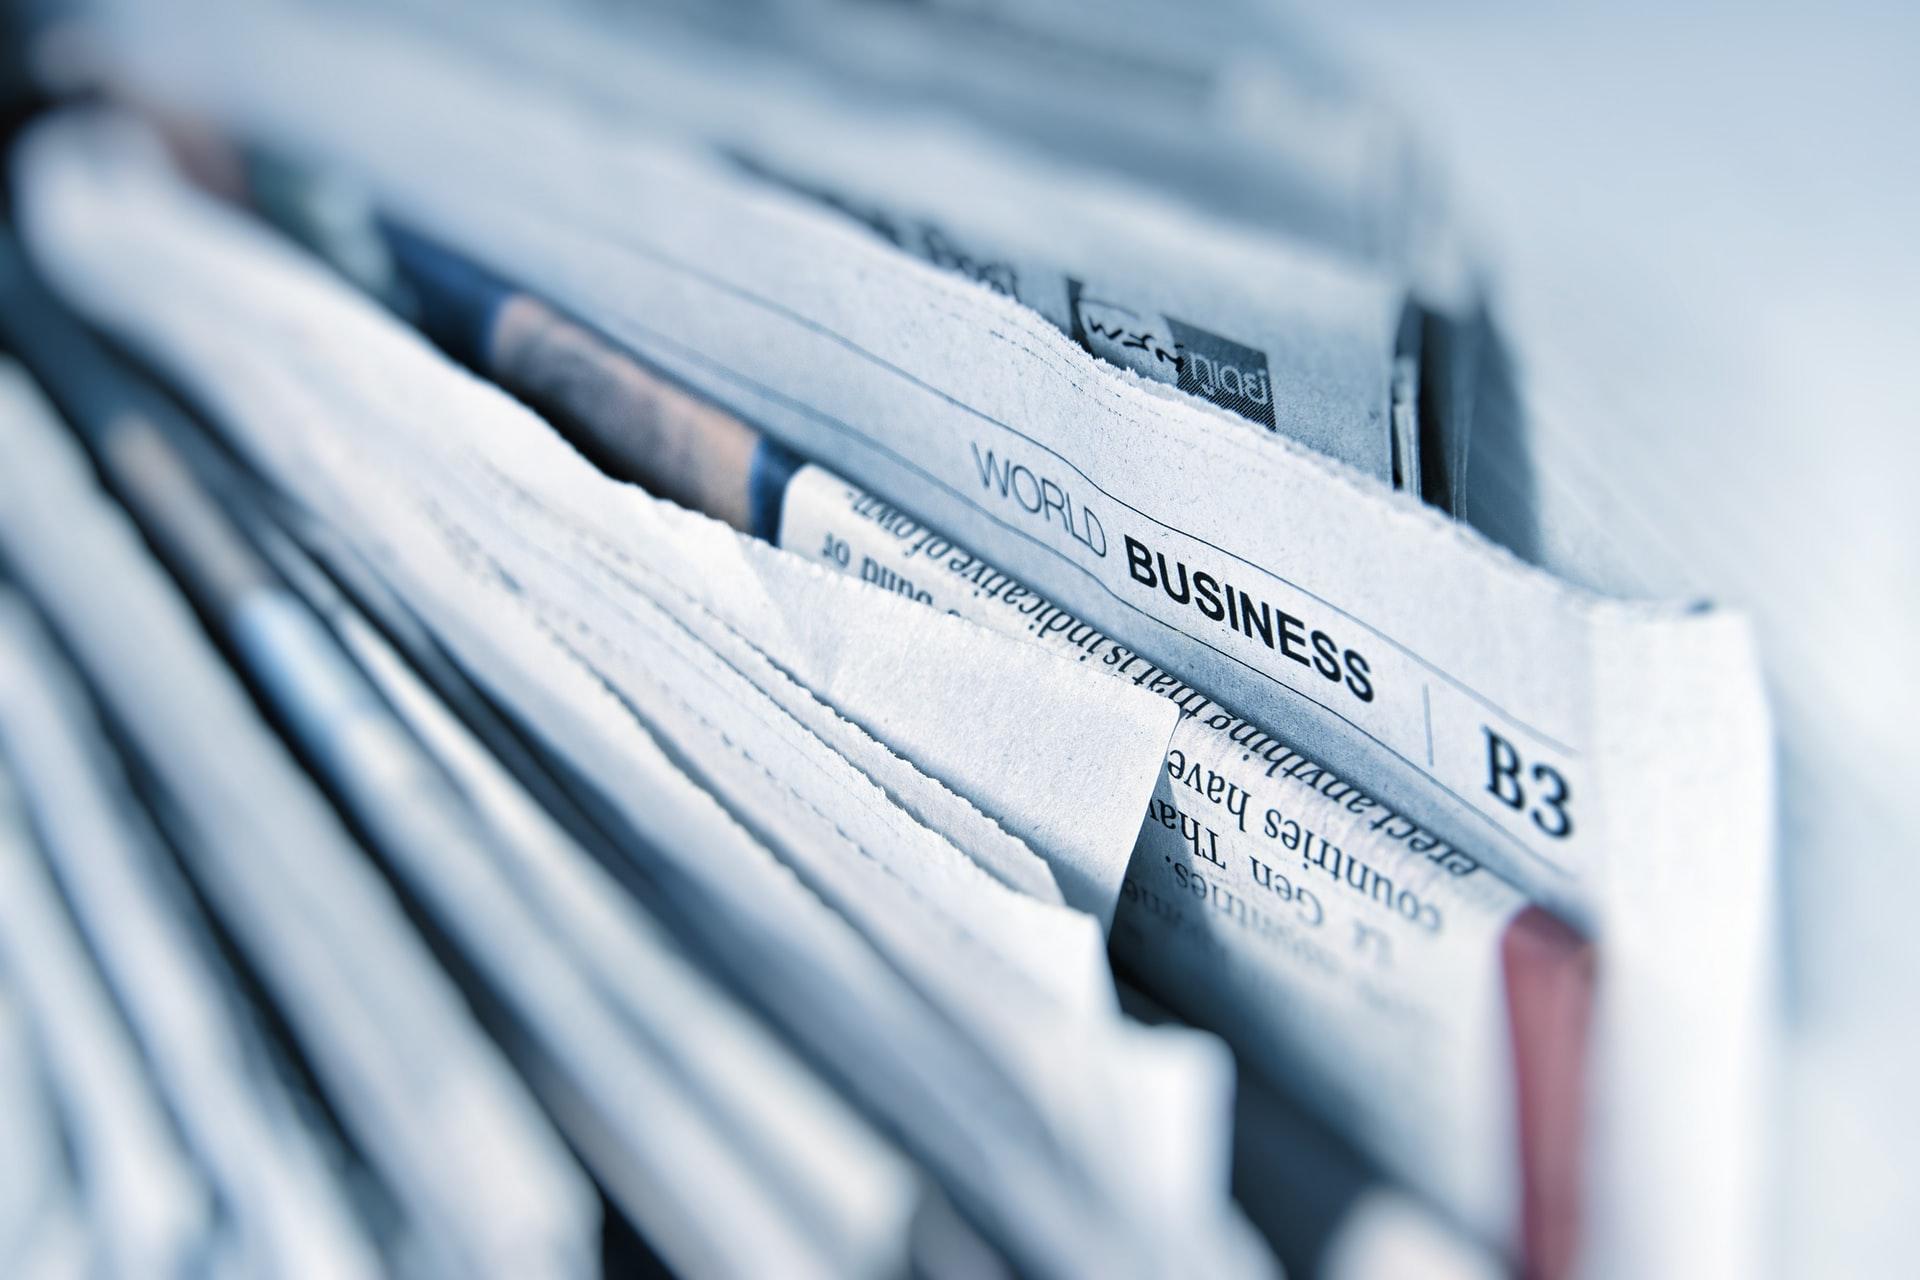 newspapers stuck